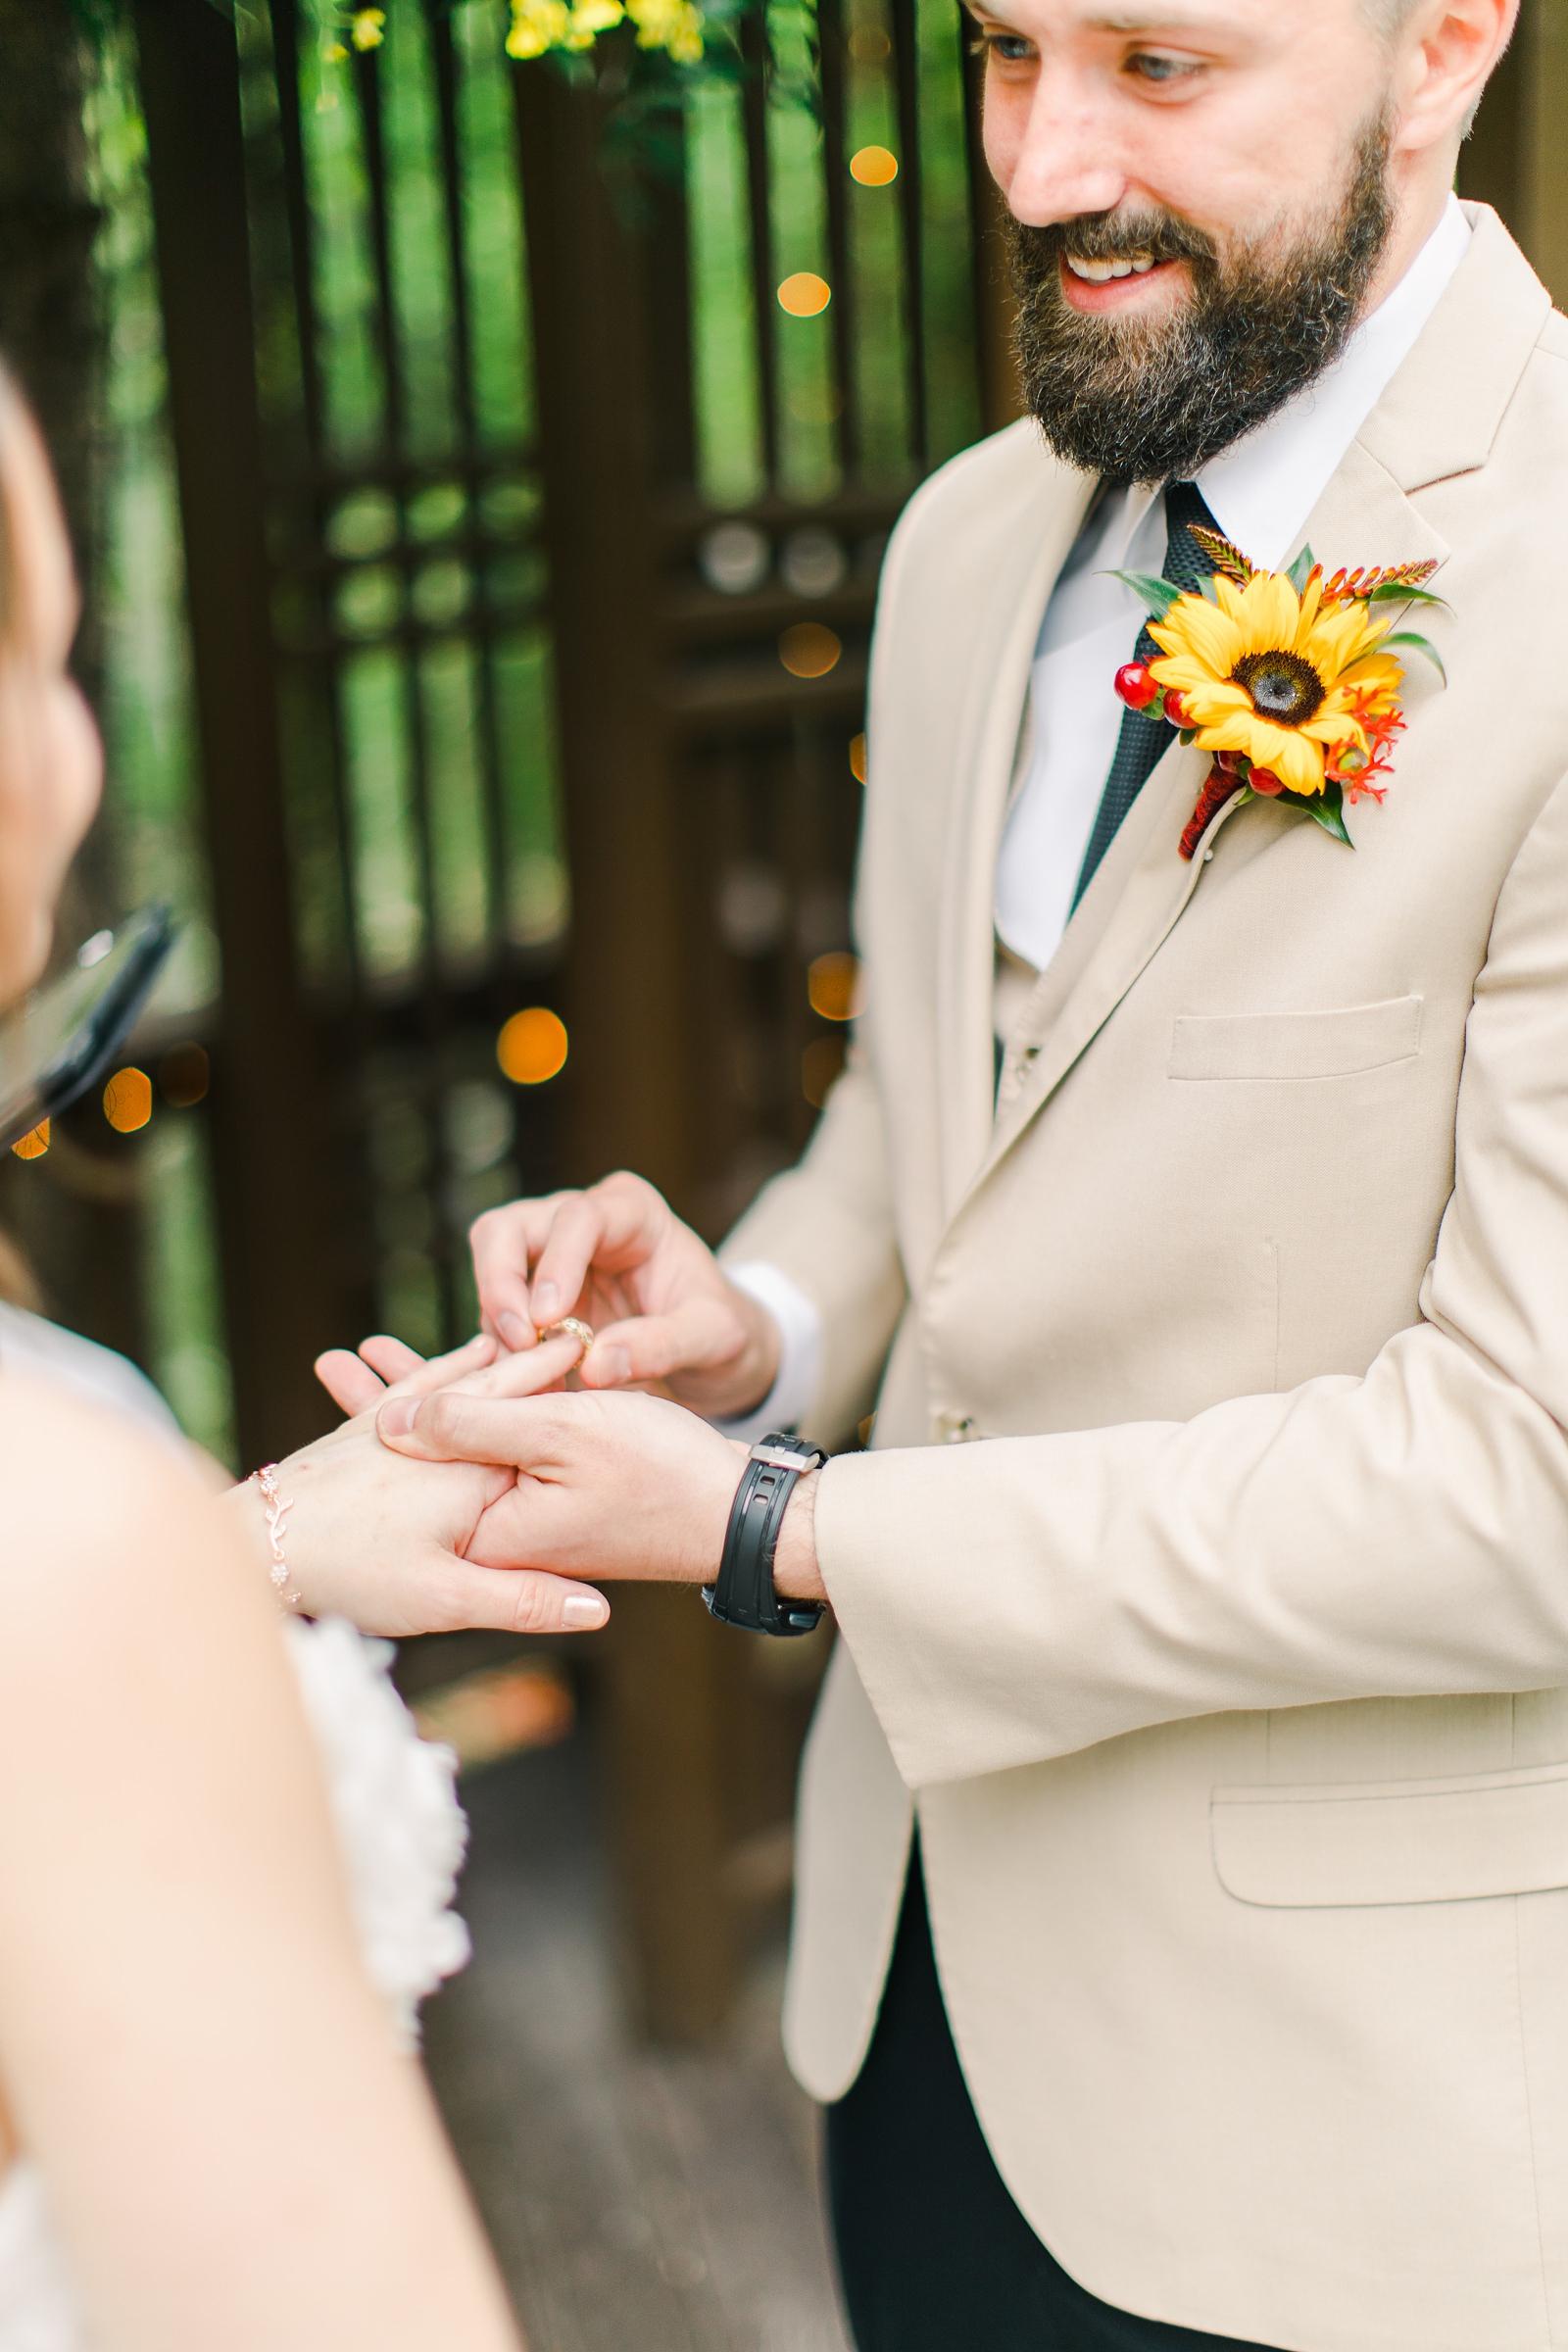 Millcreek Inn Summer Wedding, Utah wedding photography Millcreek Canyon, Salt Lake City, mountain ceremony, ring exchange